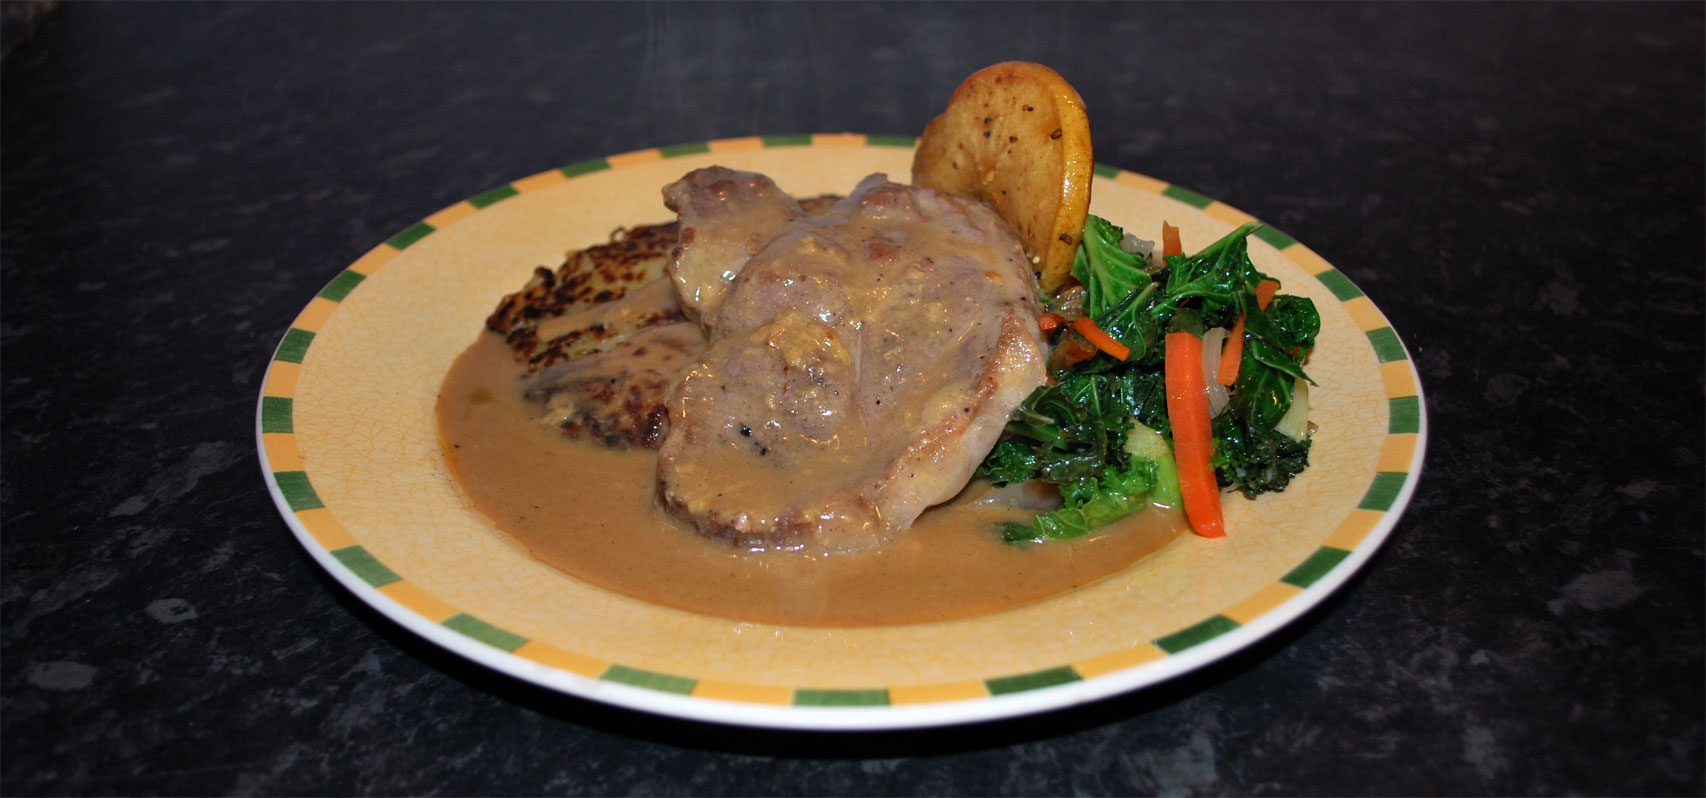 Pork Loin Steak  with Grilled Apple & Dijon Sauce